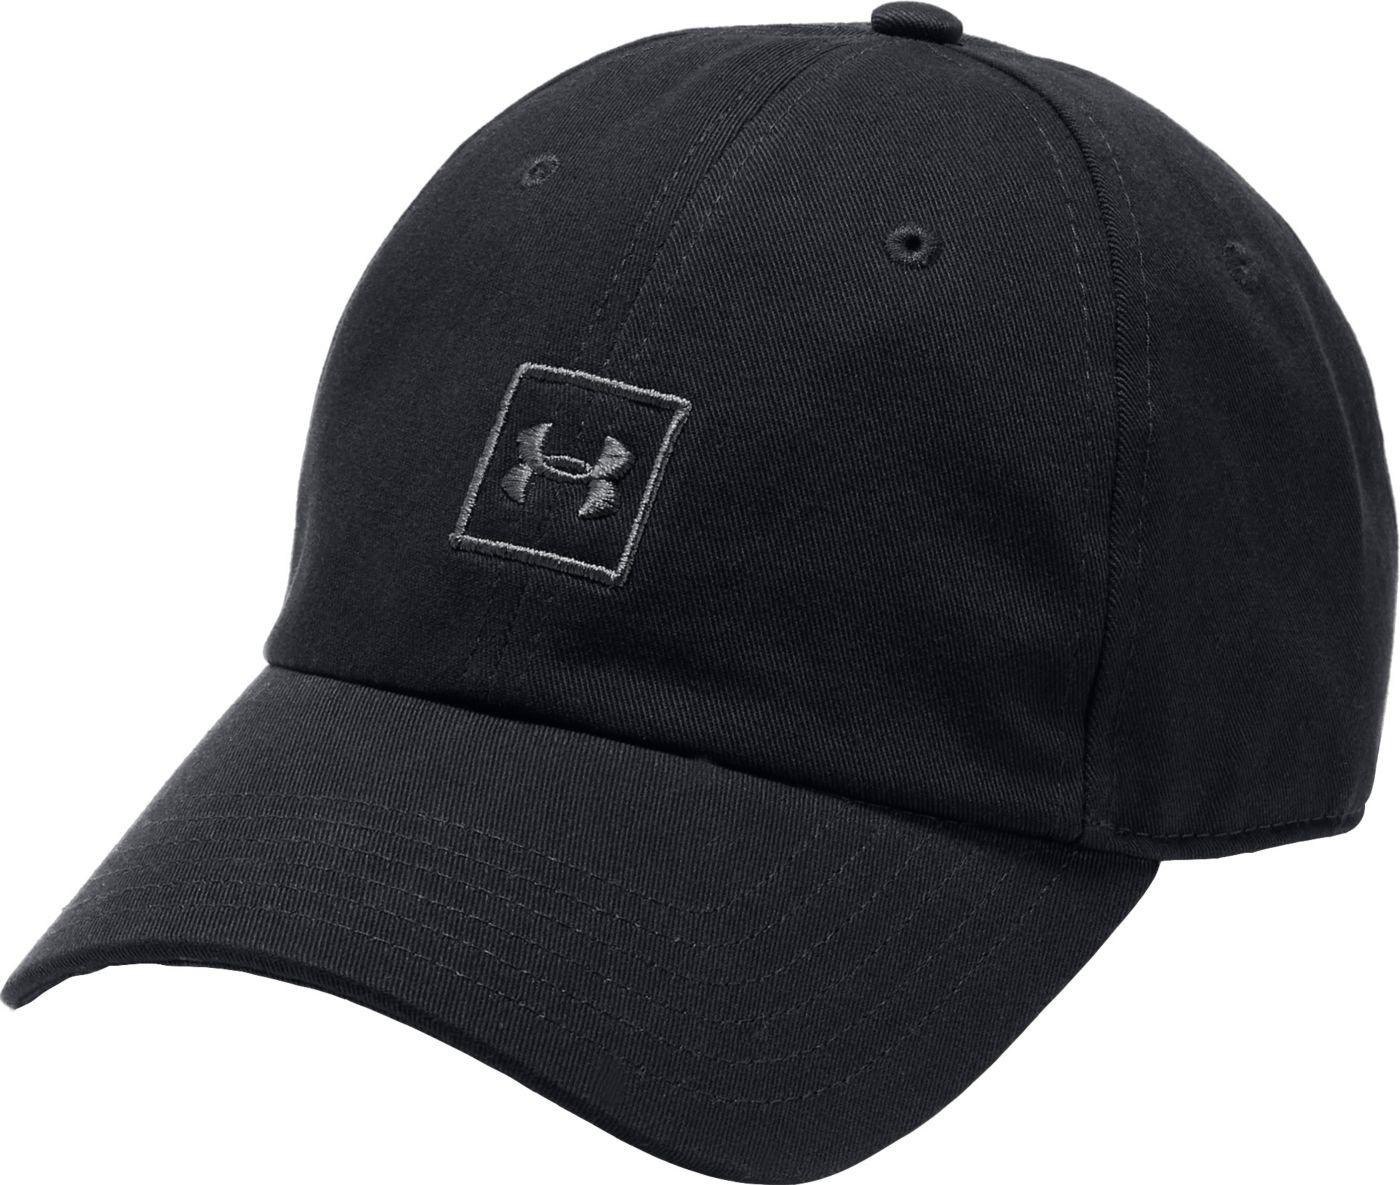 Under Armour Men's Washed Cotton Hat